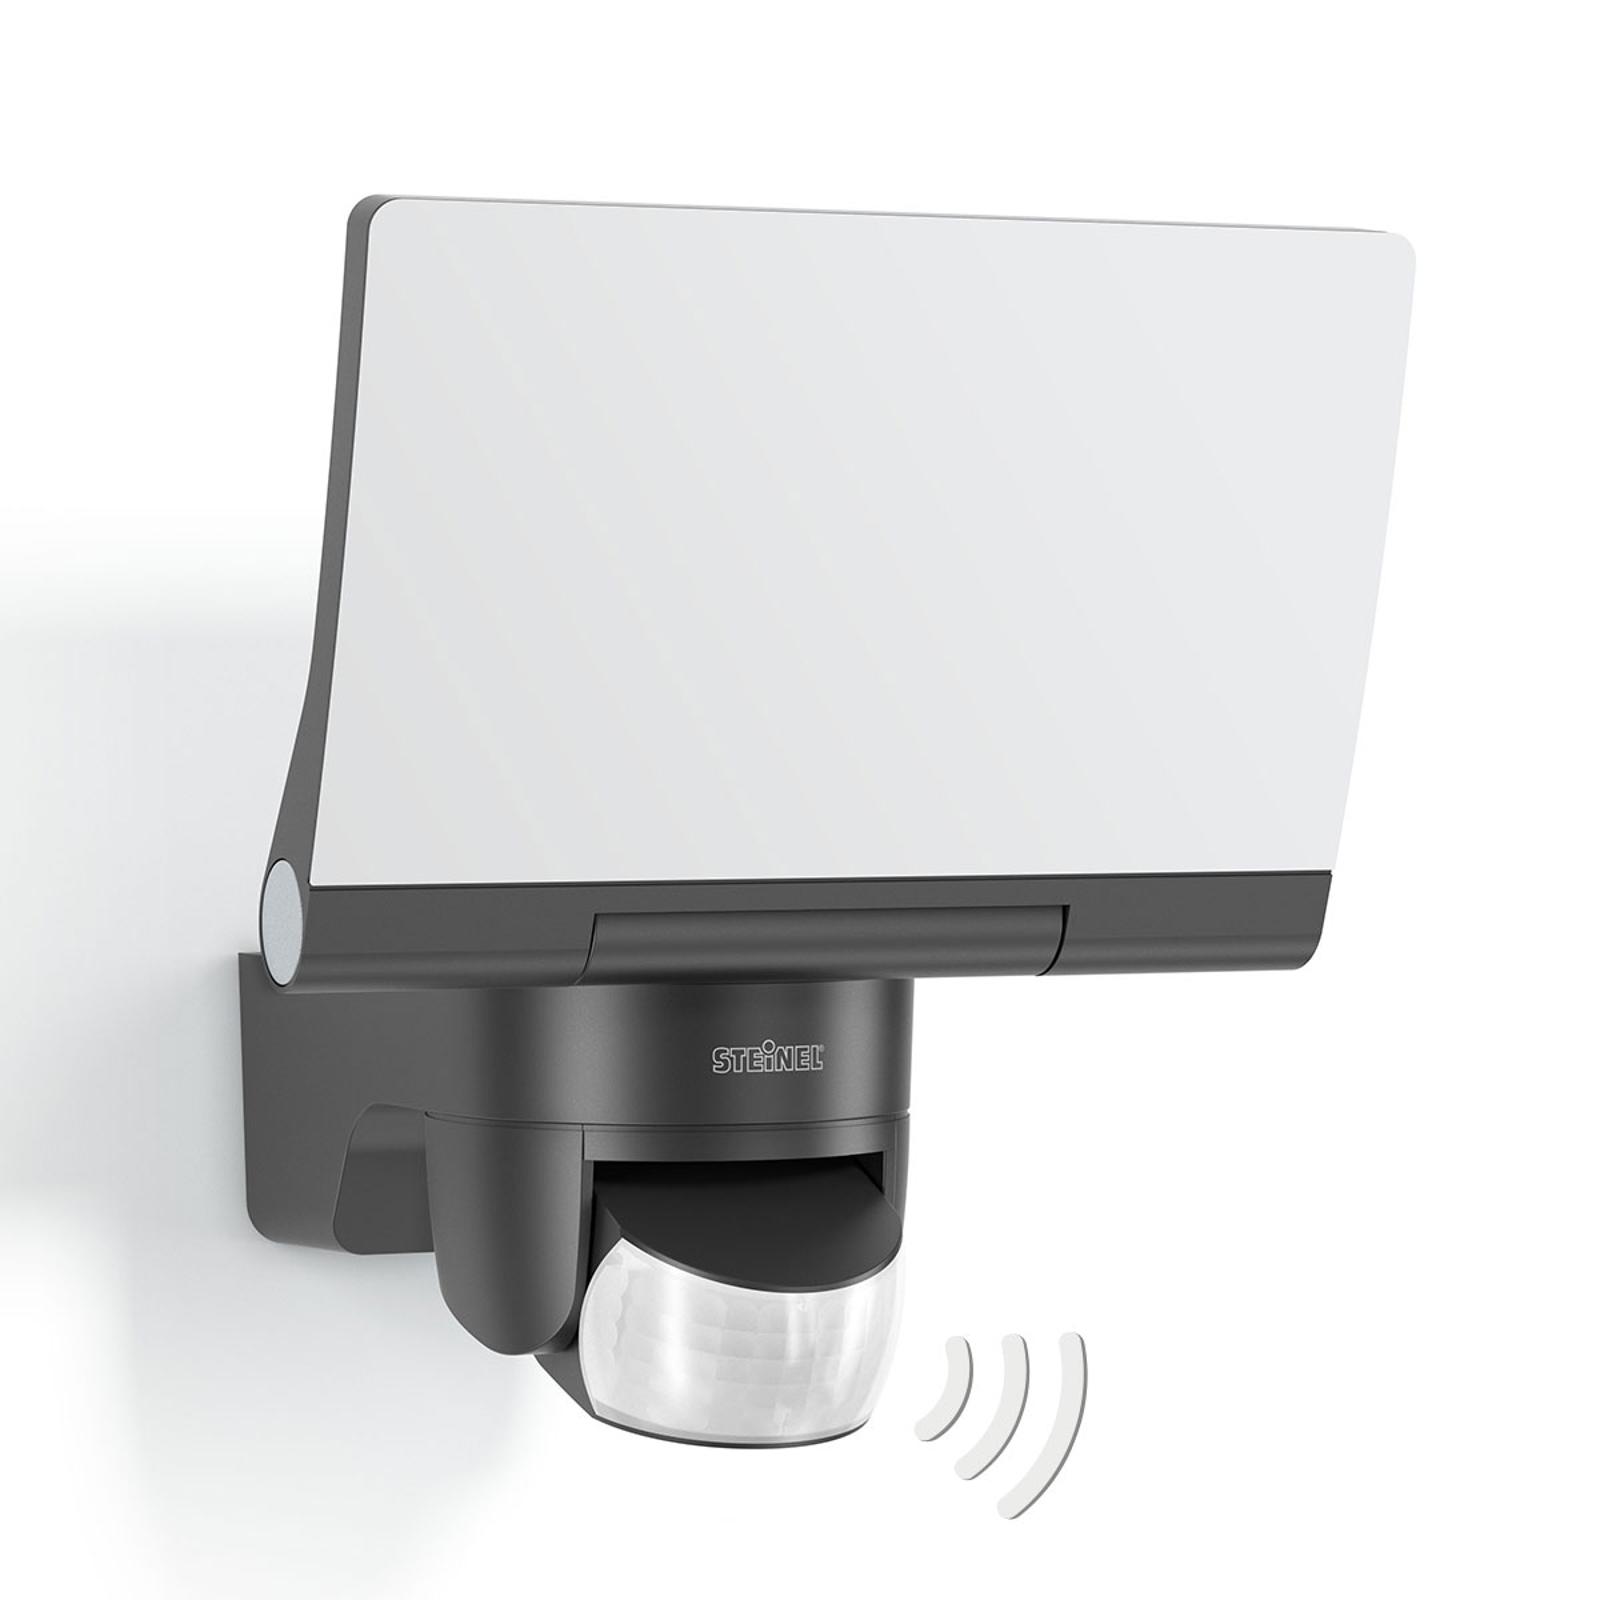 STEINEL XLED Home 2 Smart Friends LED spotlight_8505743_1